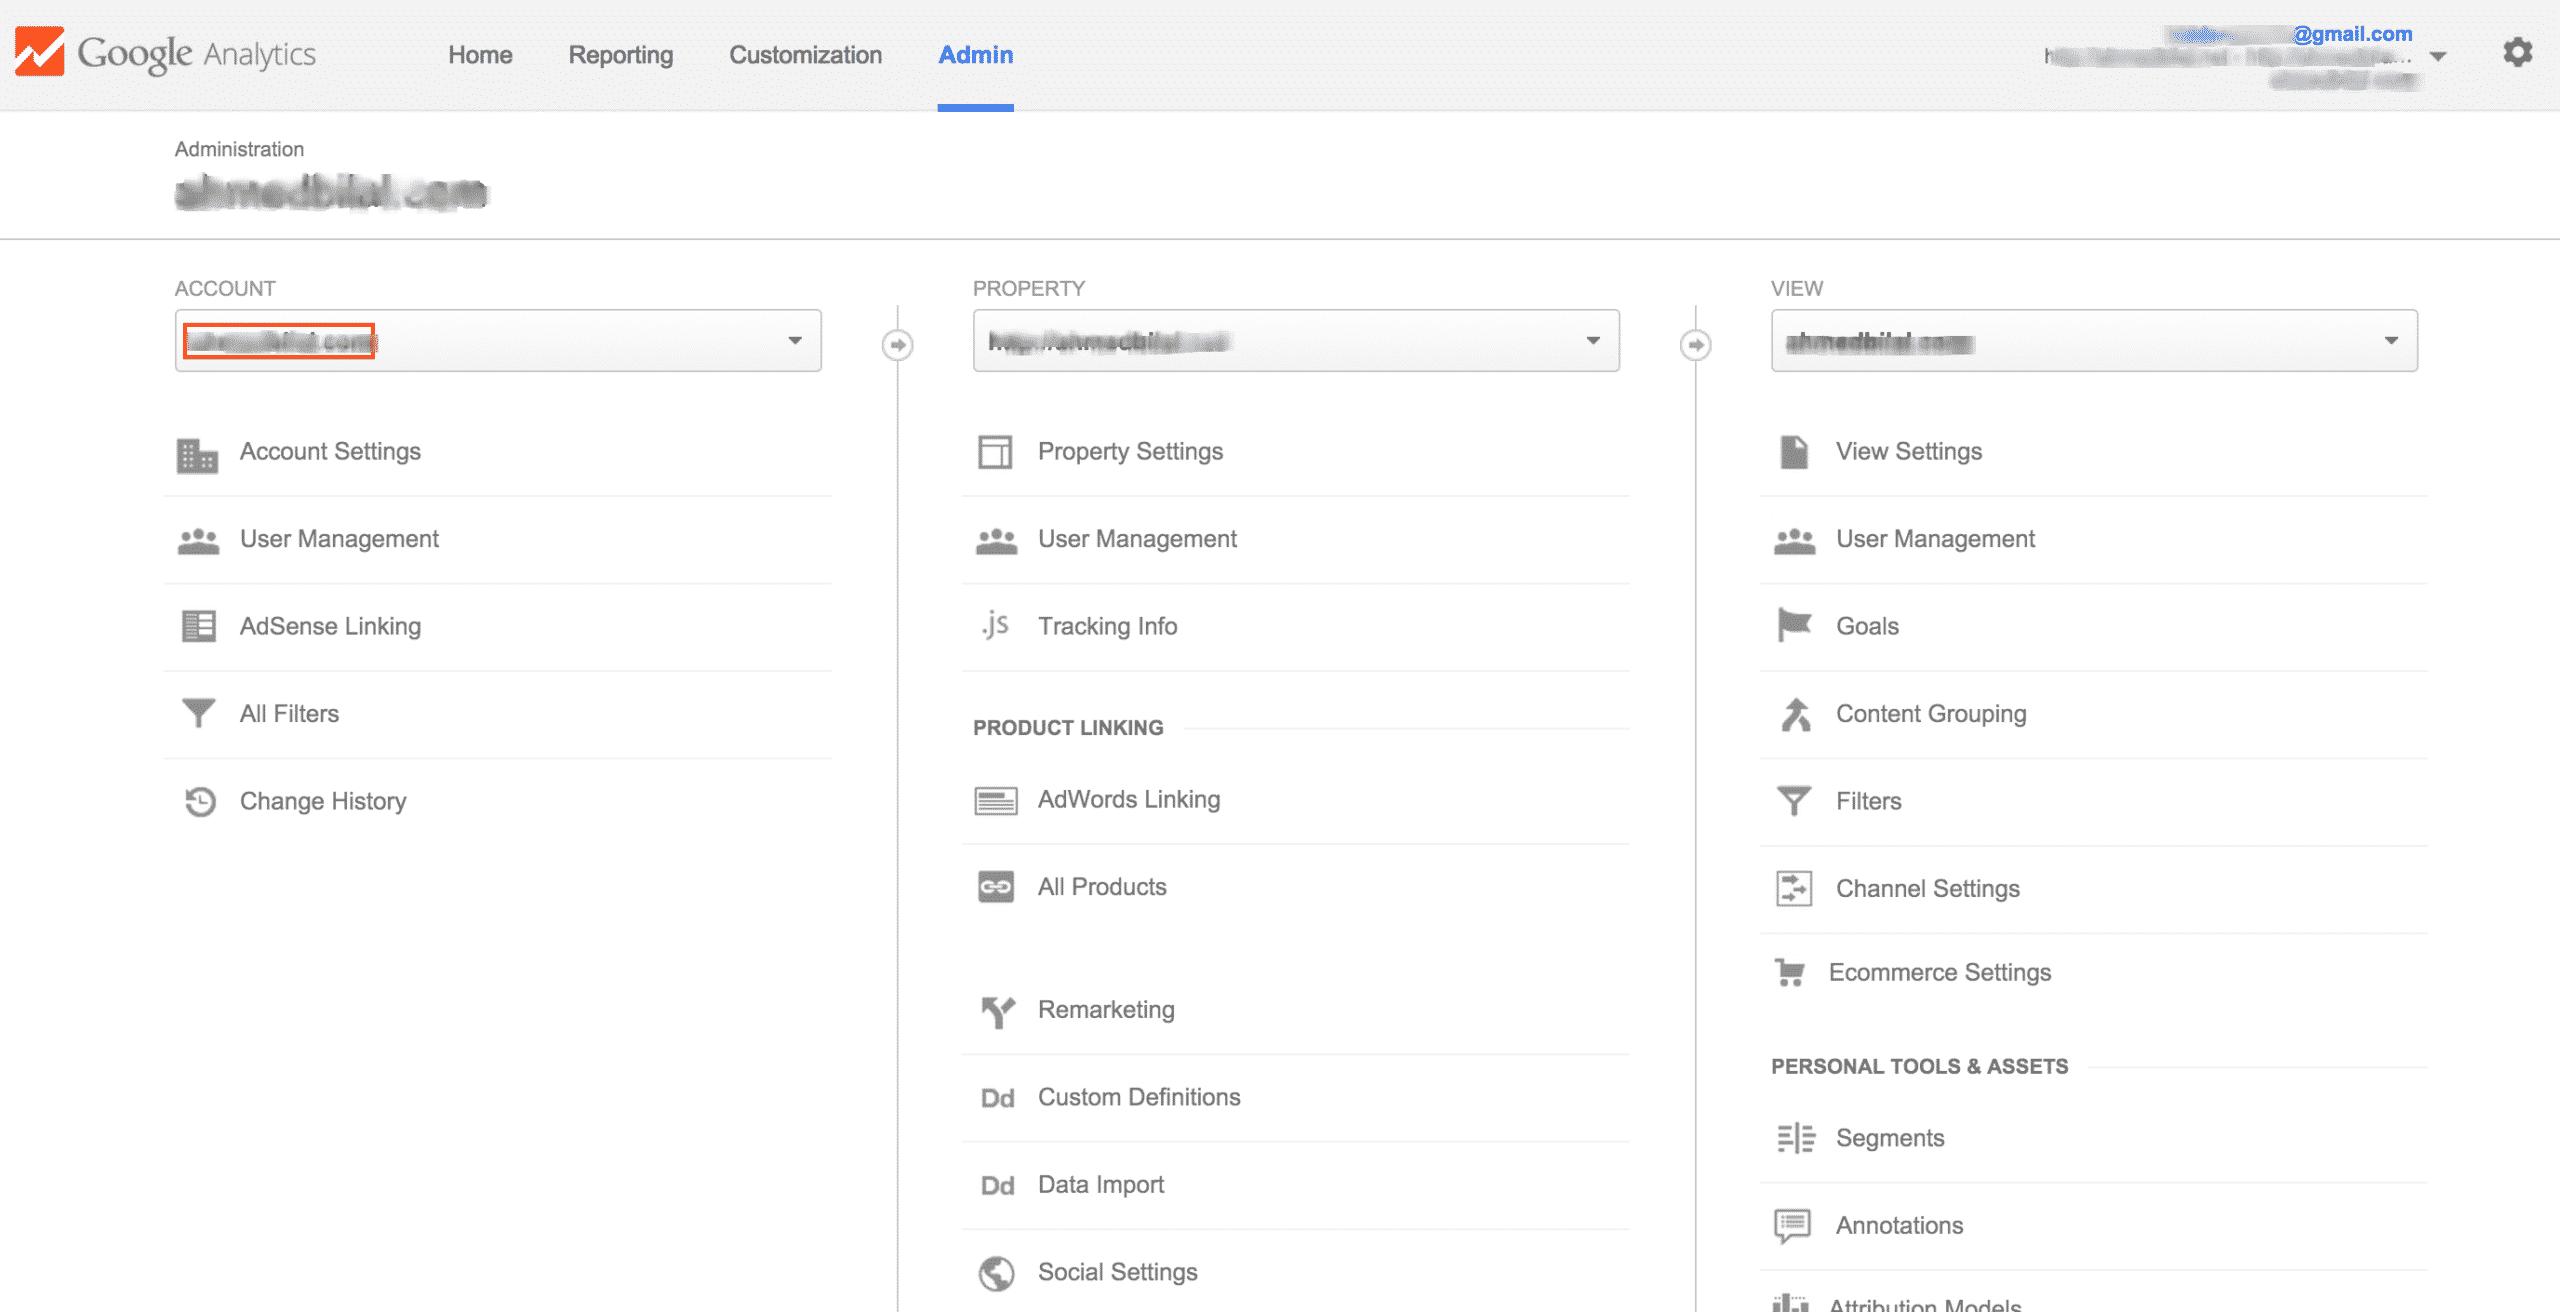 Google Analytics - Admin